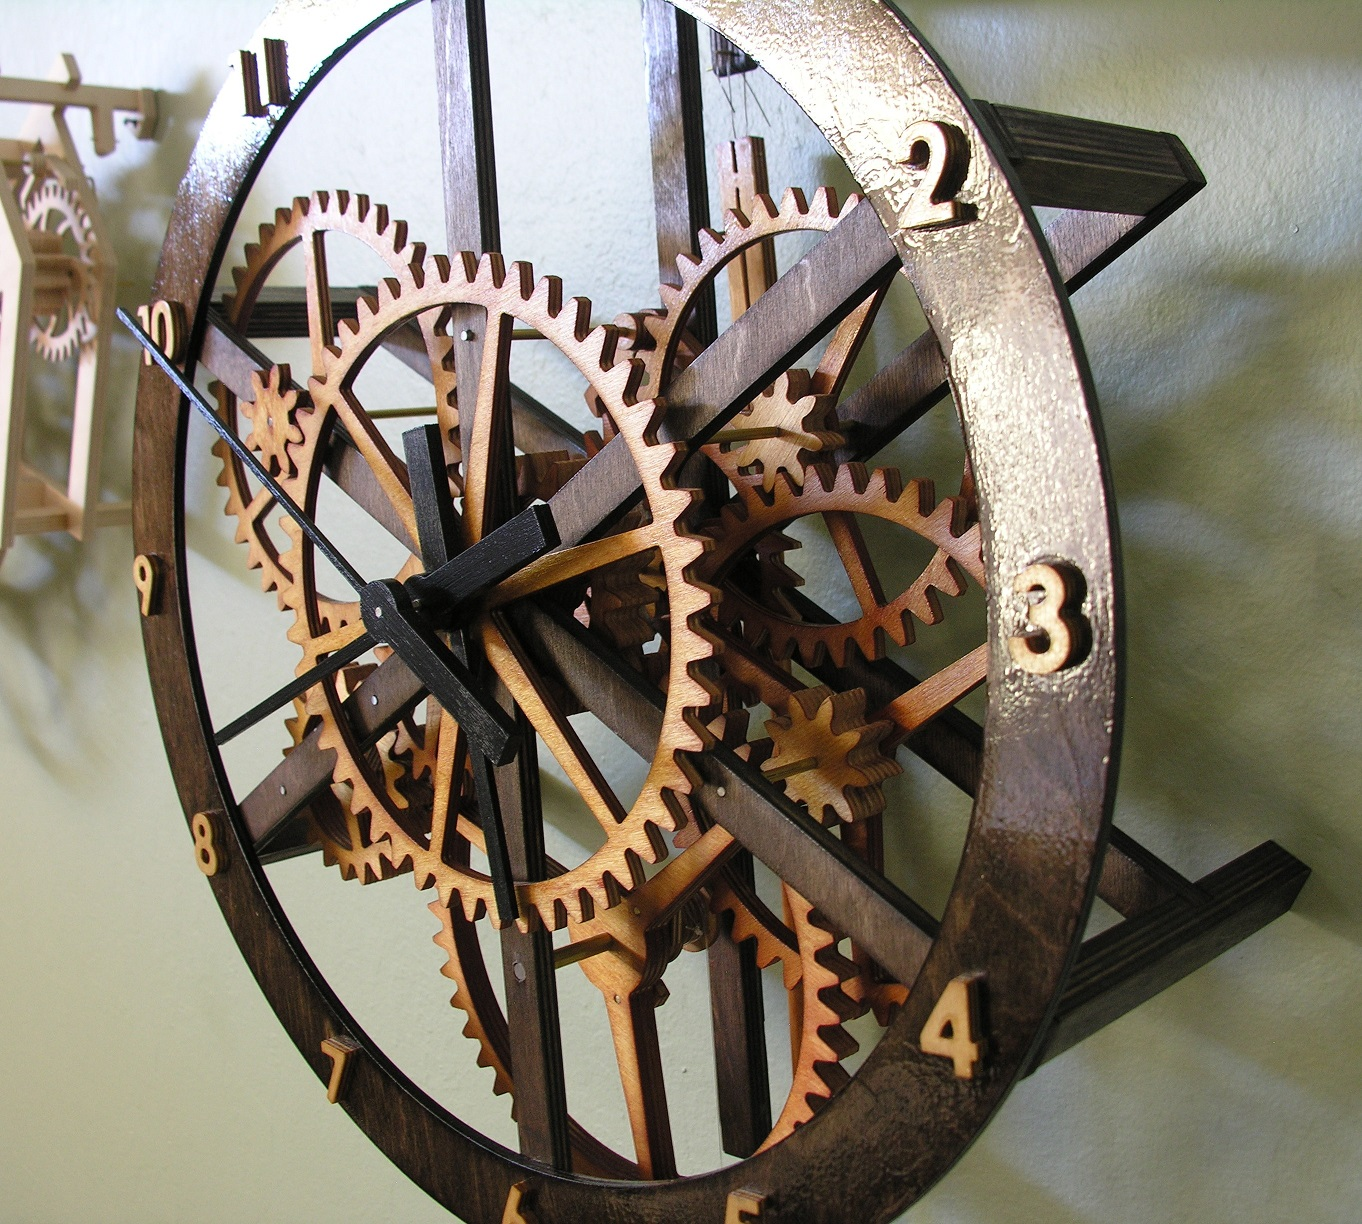 Starchar Clock Plans The Wooden Clock